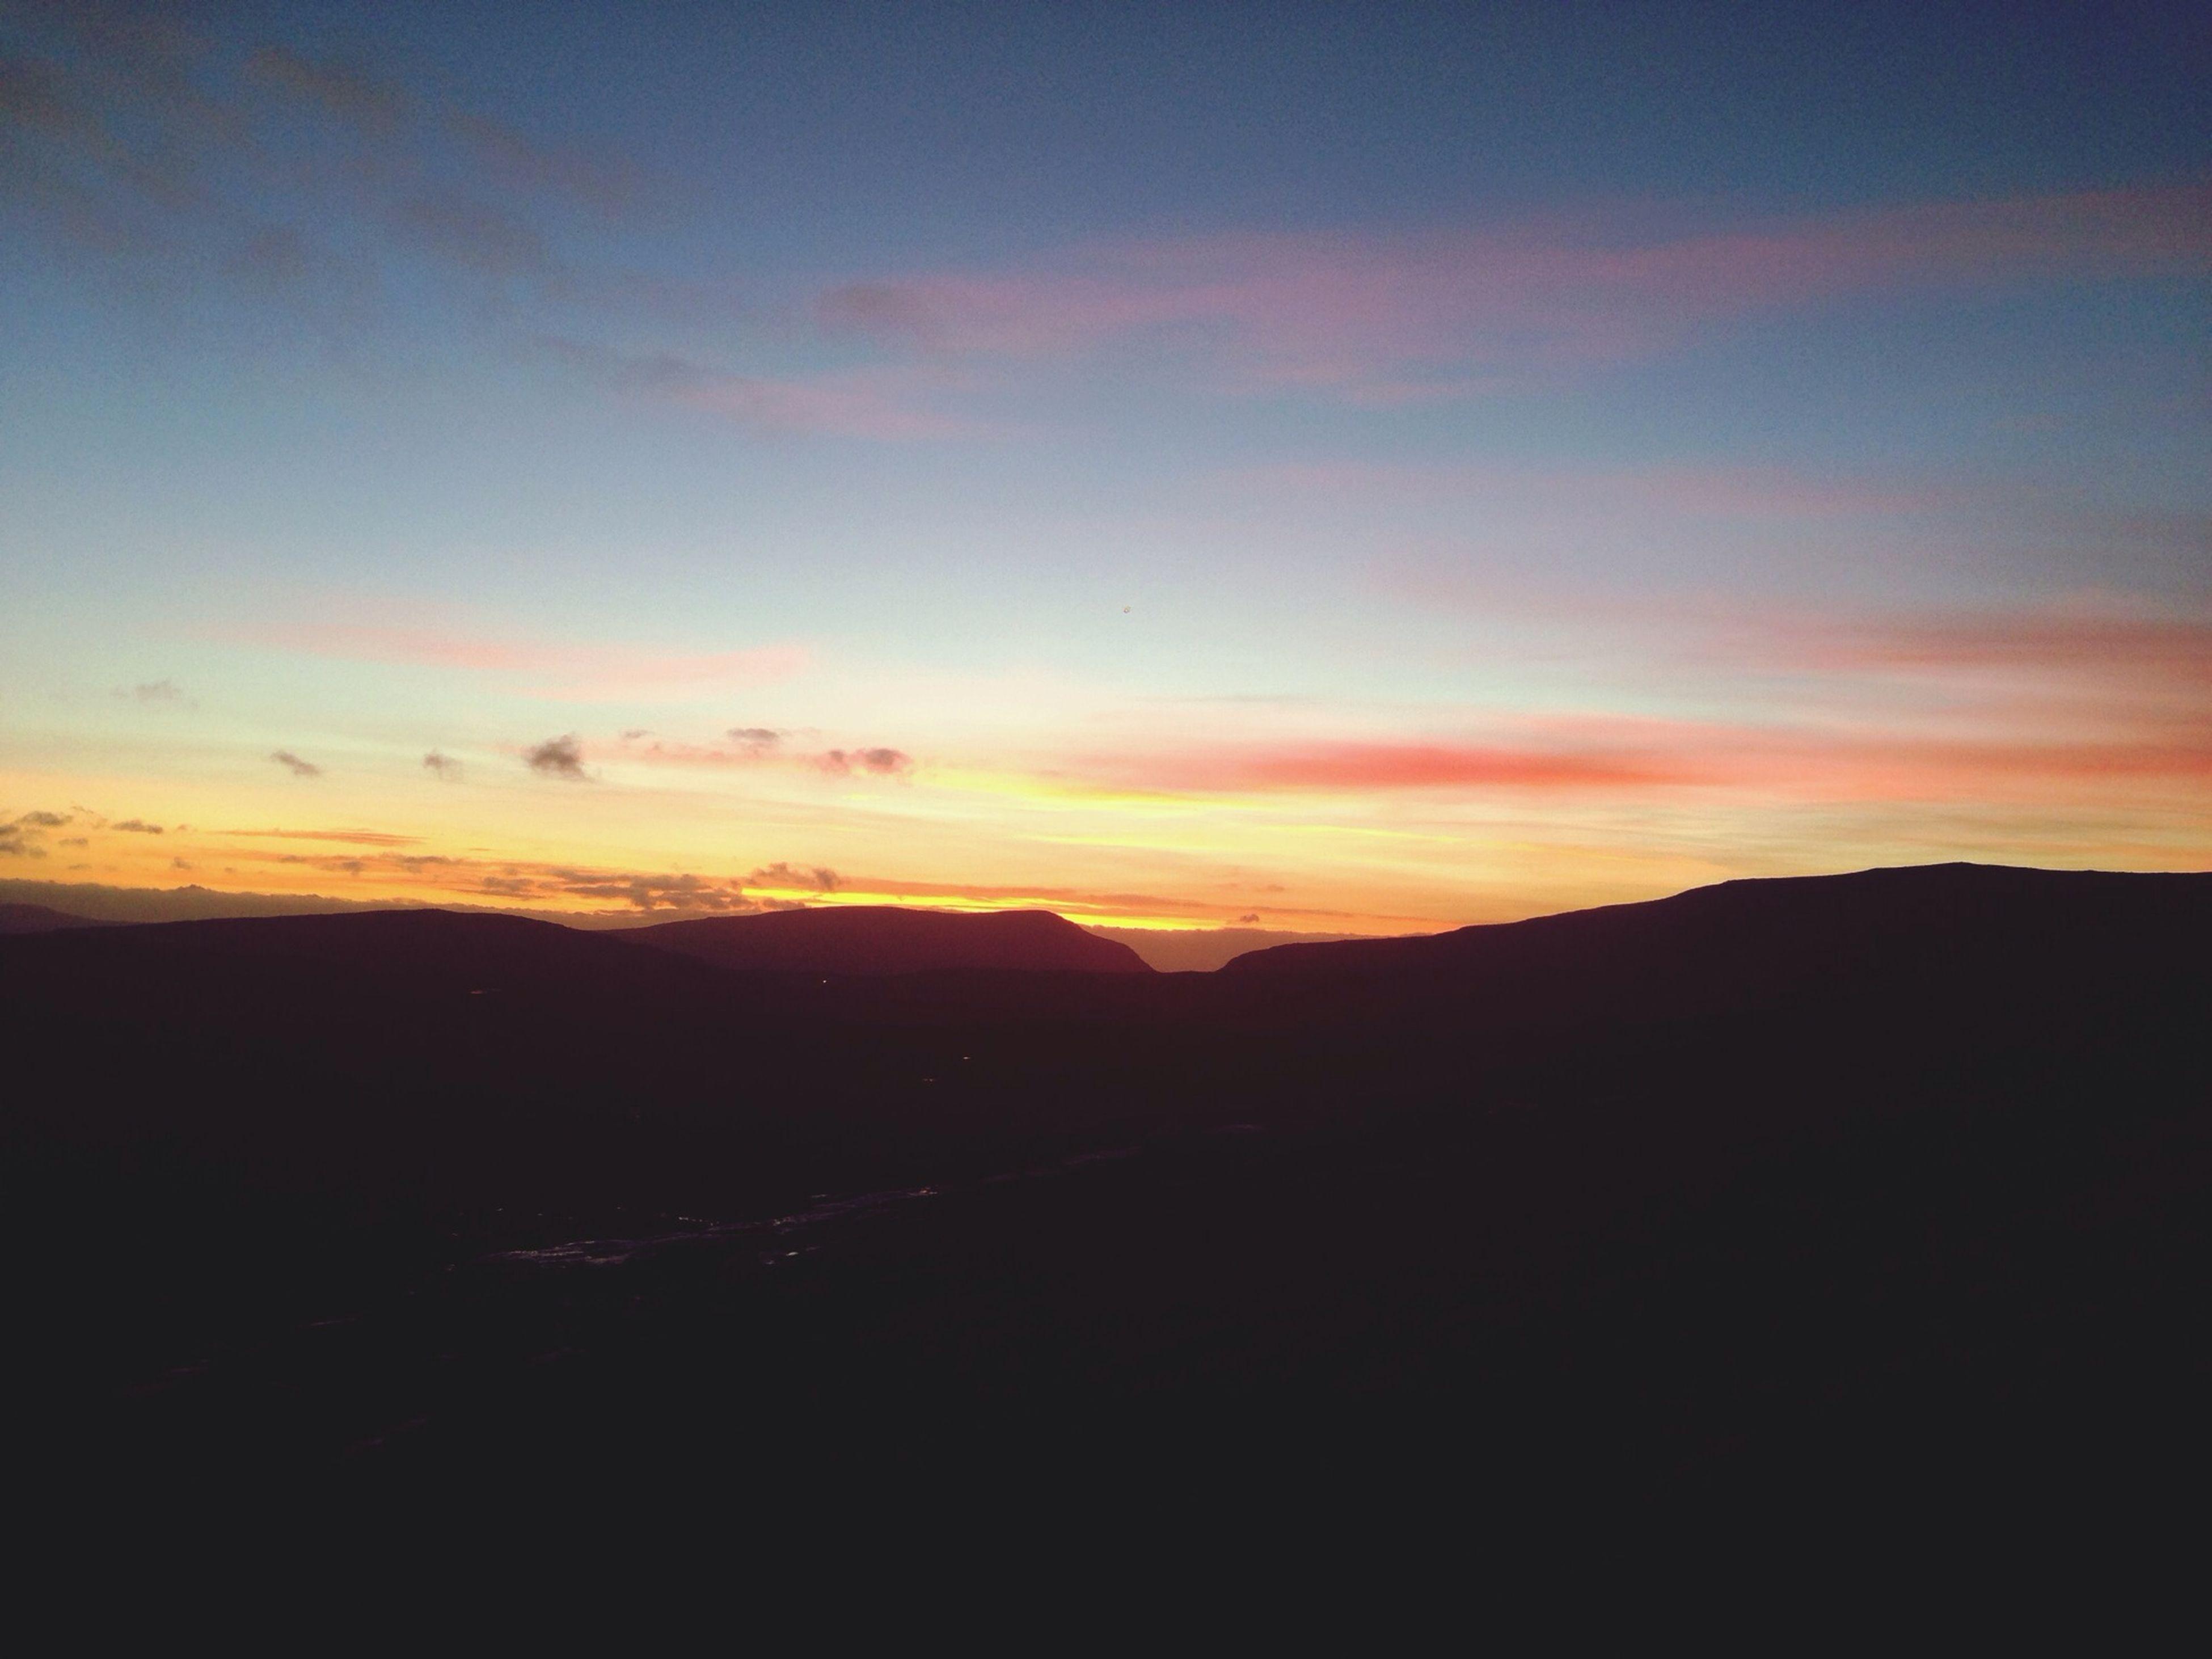 sunset, silhouette, scenics, tranquil scene, tranquility, beauty in nature, sky, mountain, landscape, nature, idyllic, orange color, mountain range, cloud - sky, dusk, cloud, dark, non-urban scene, outdoors, copy space